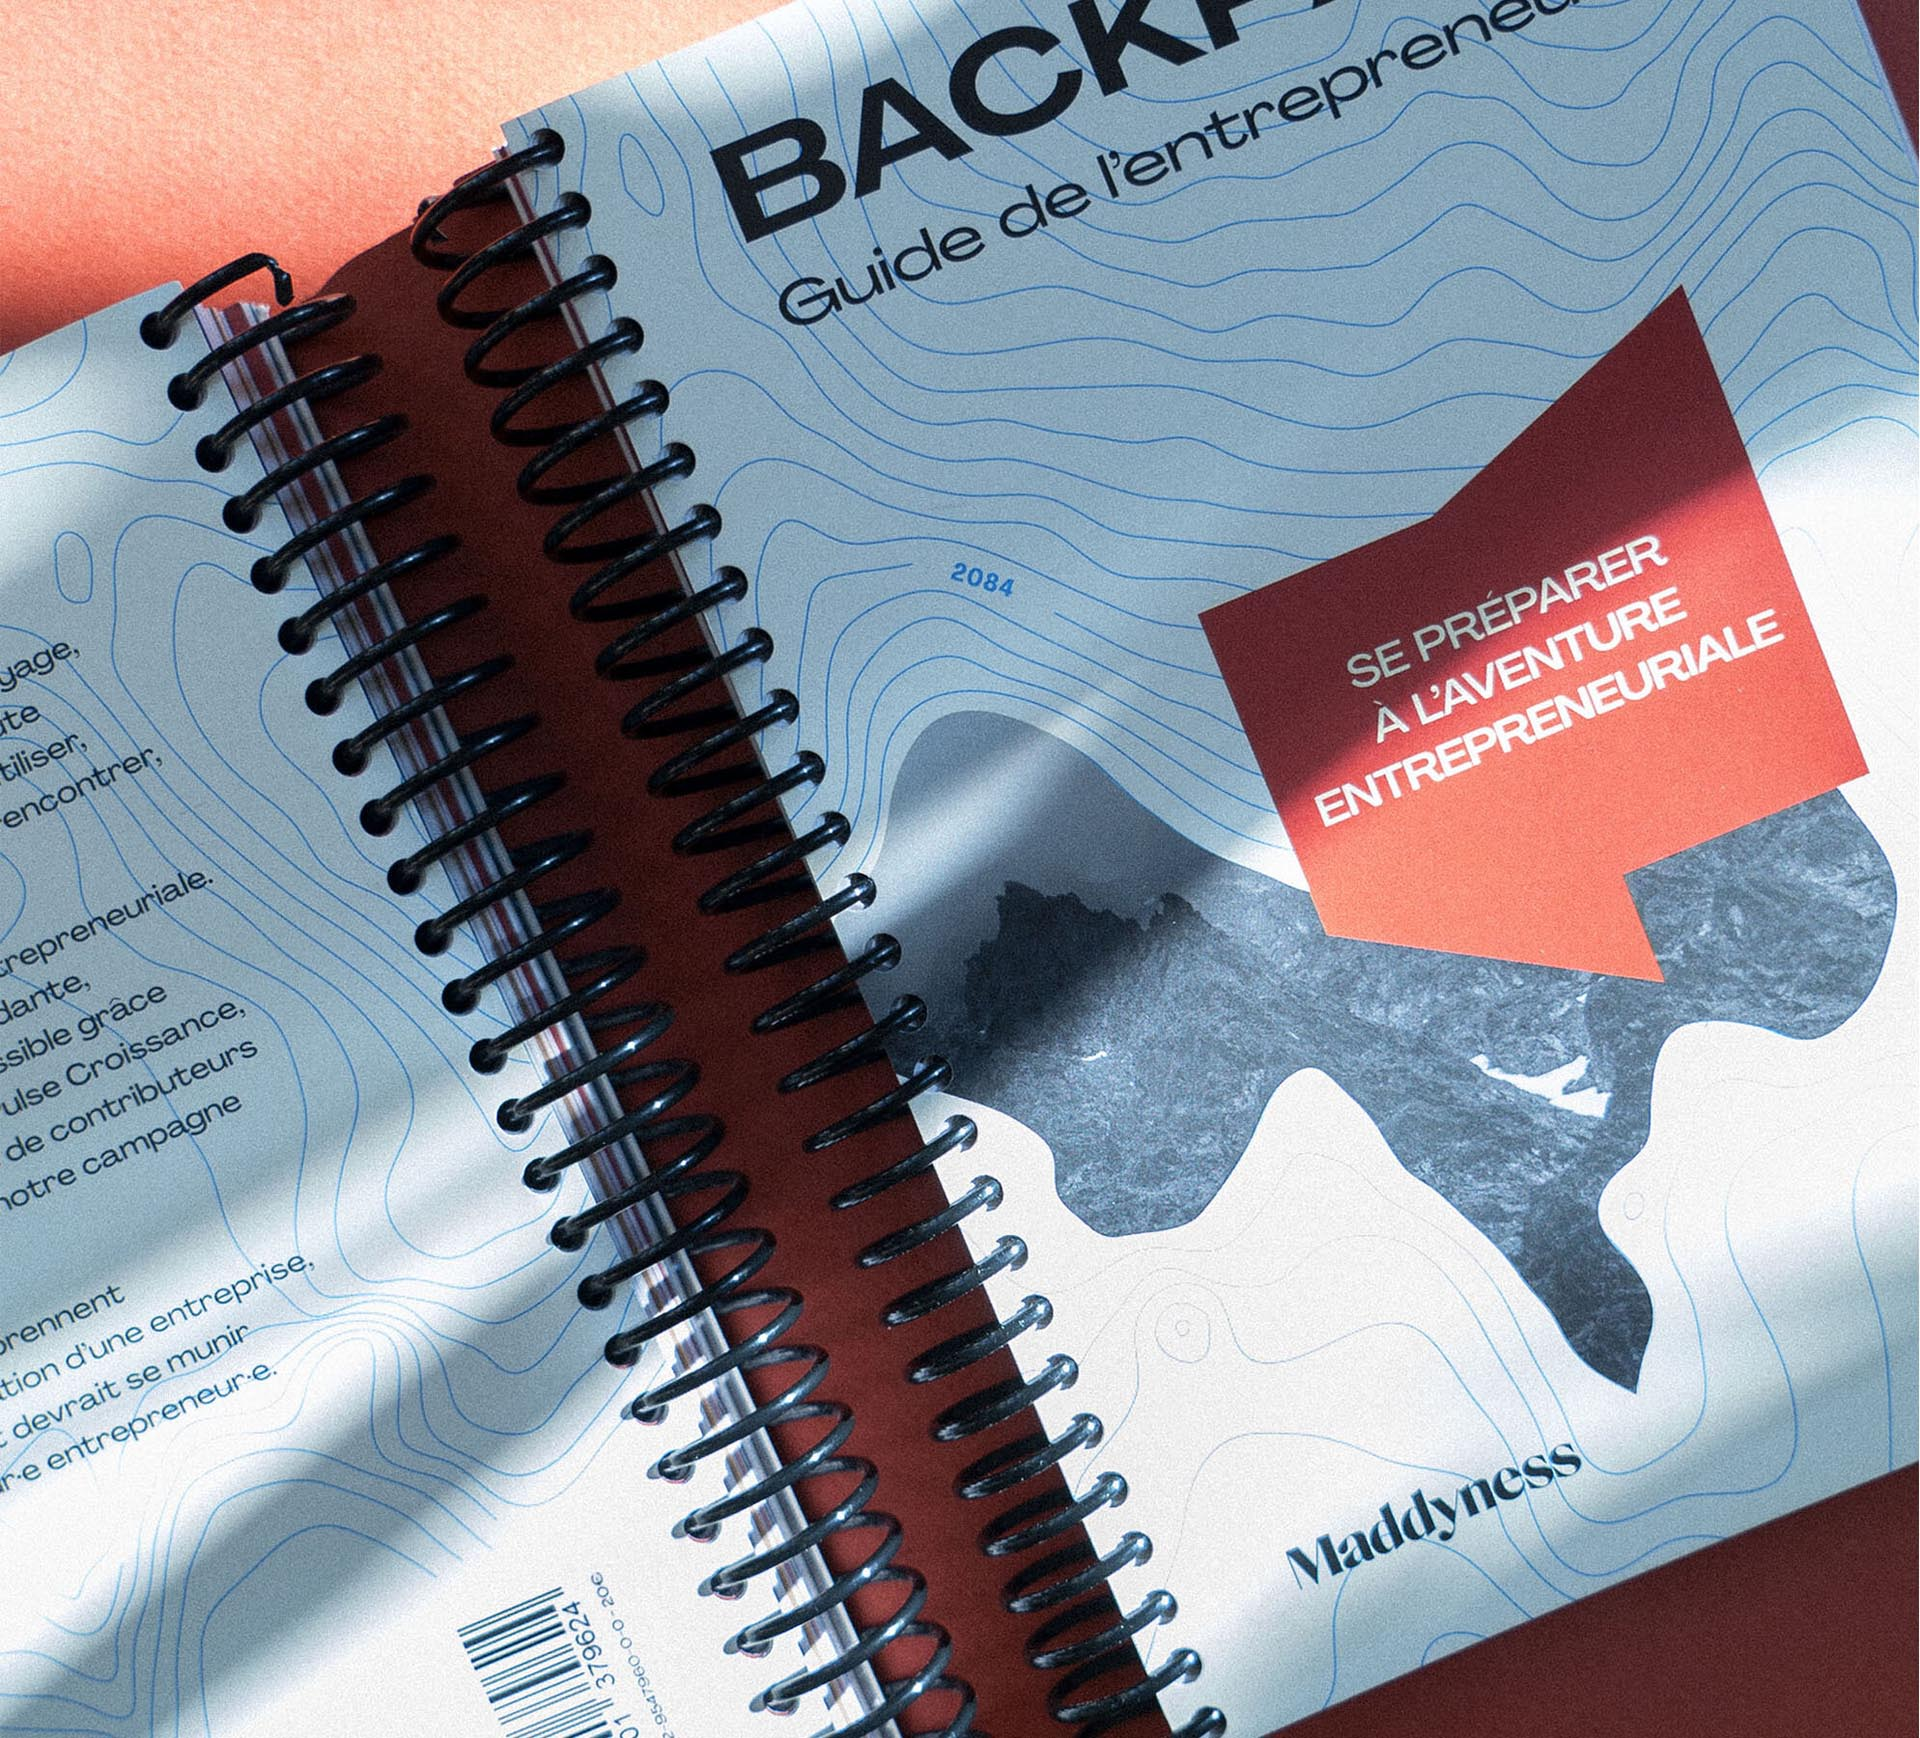 Le succès du Backpack de Maddyness sur KissKissBankBank